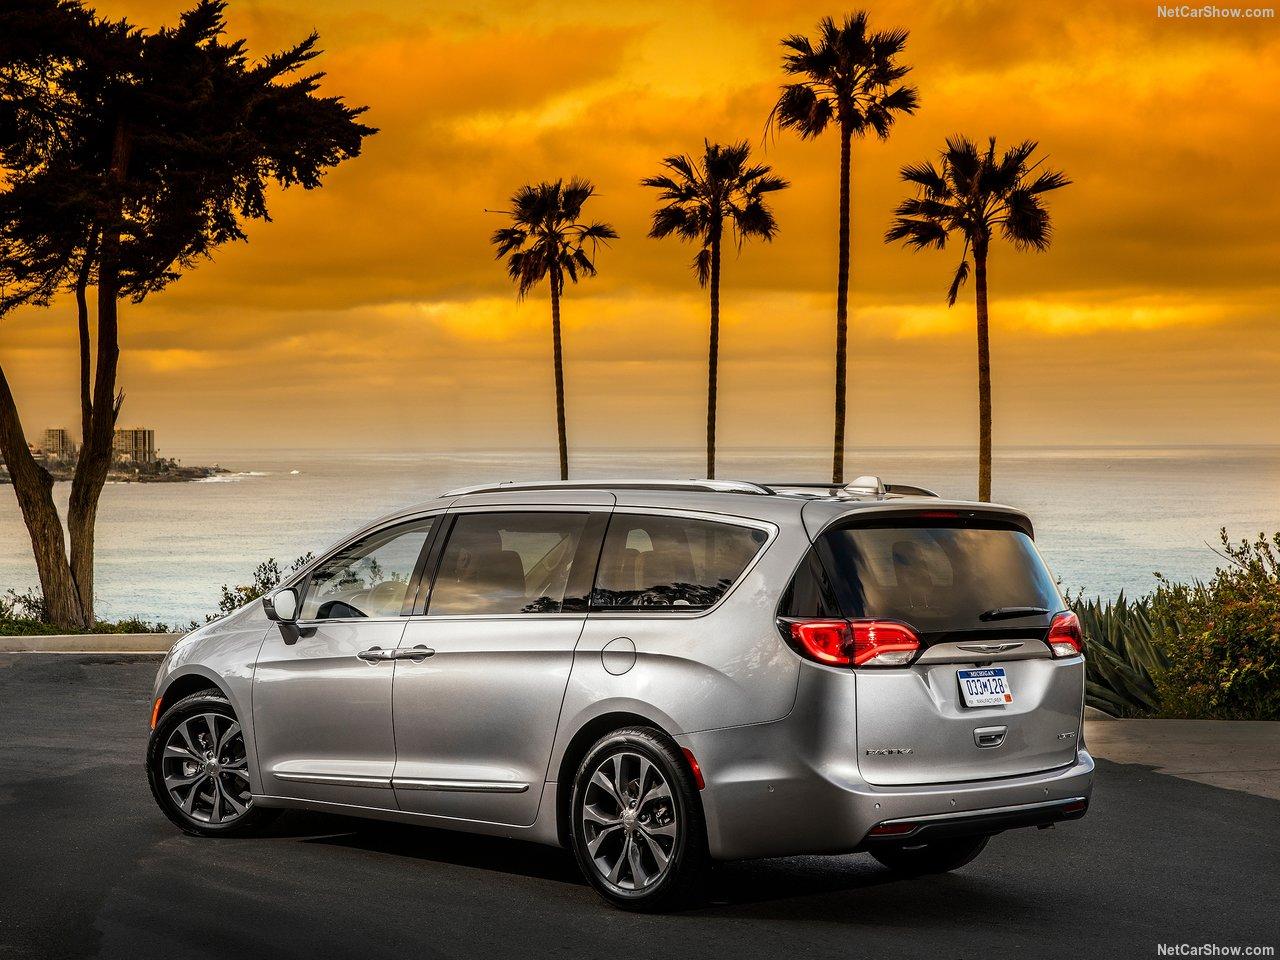 Chrysler Pacifica 2020 3.6L V6 Touring L in UAE: New Car ...